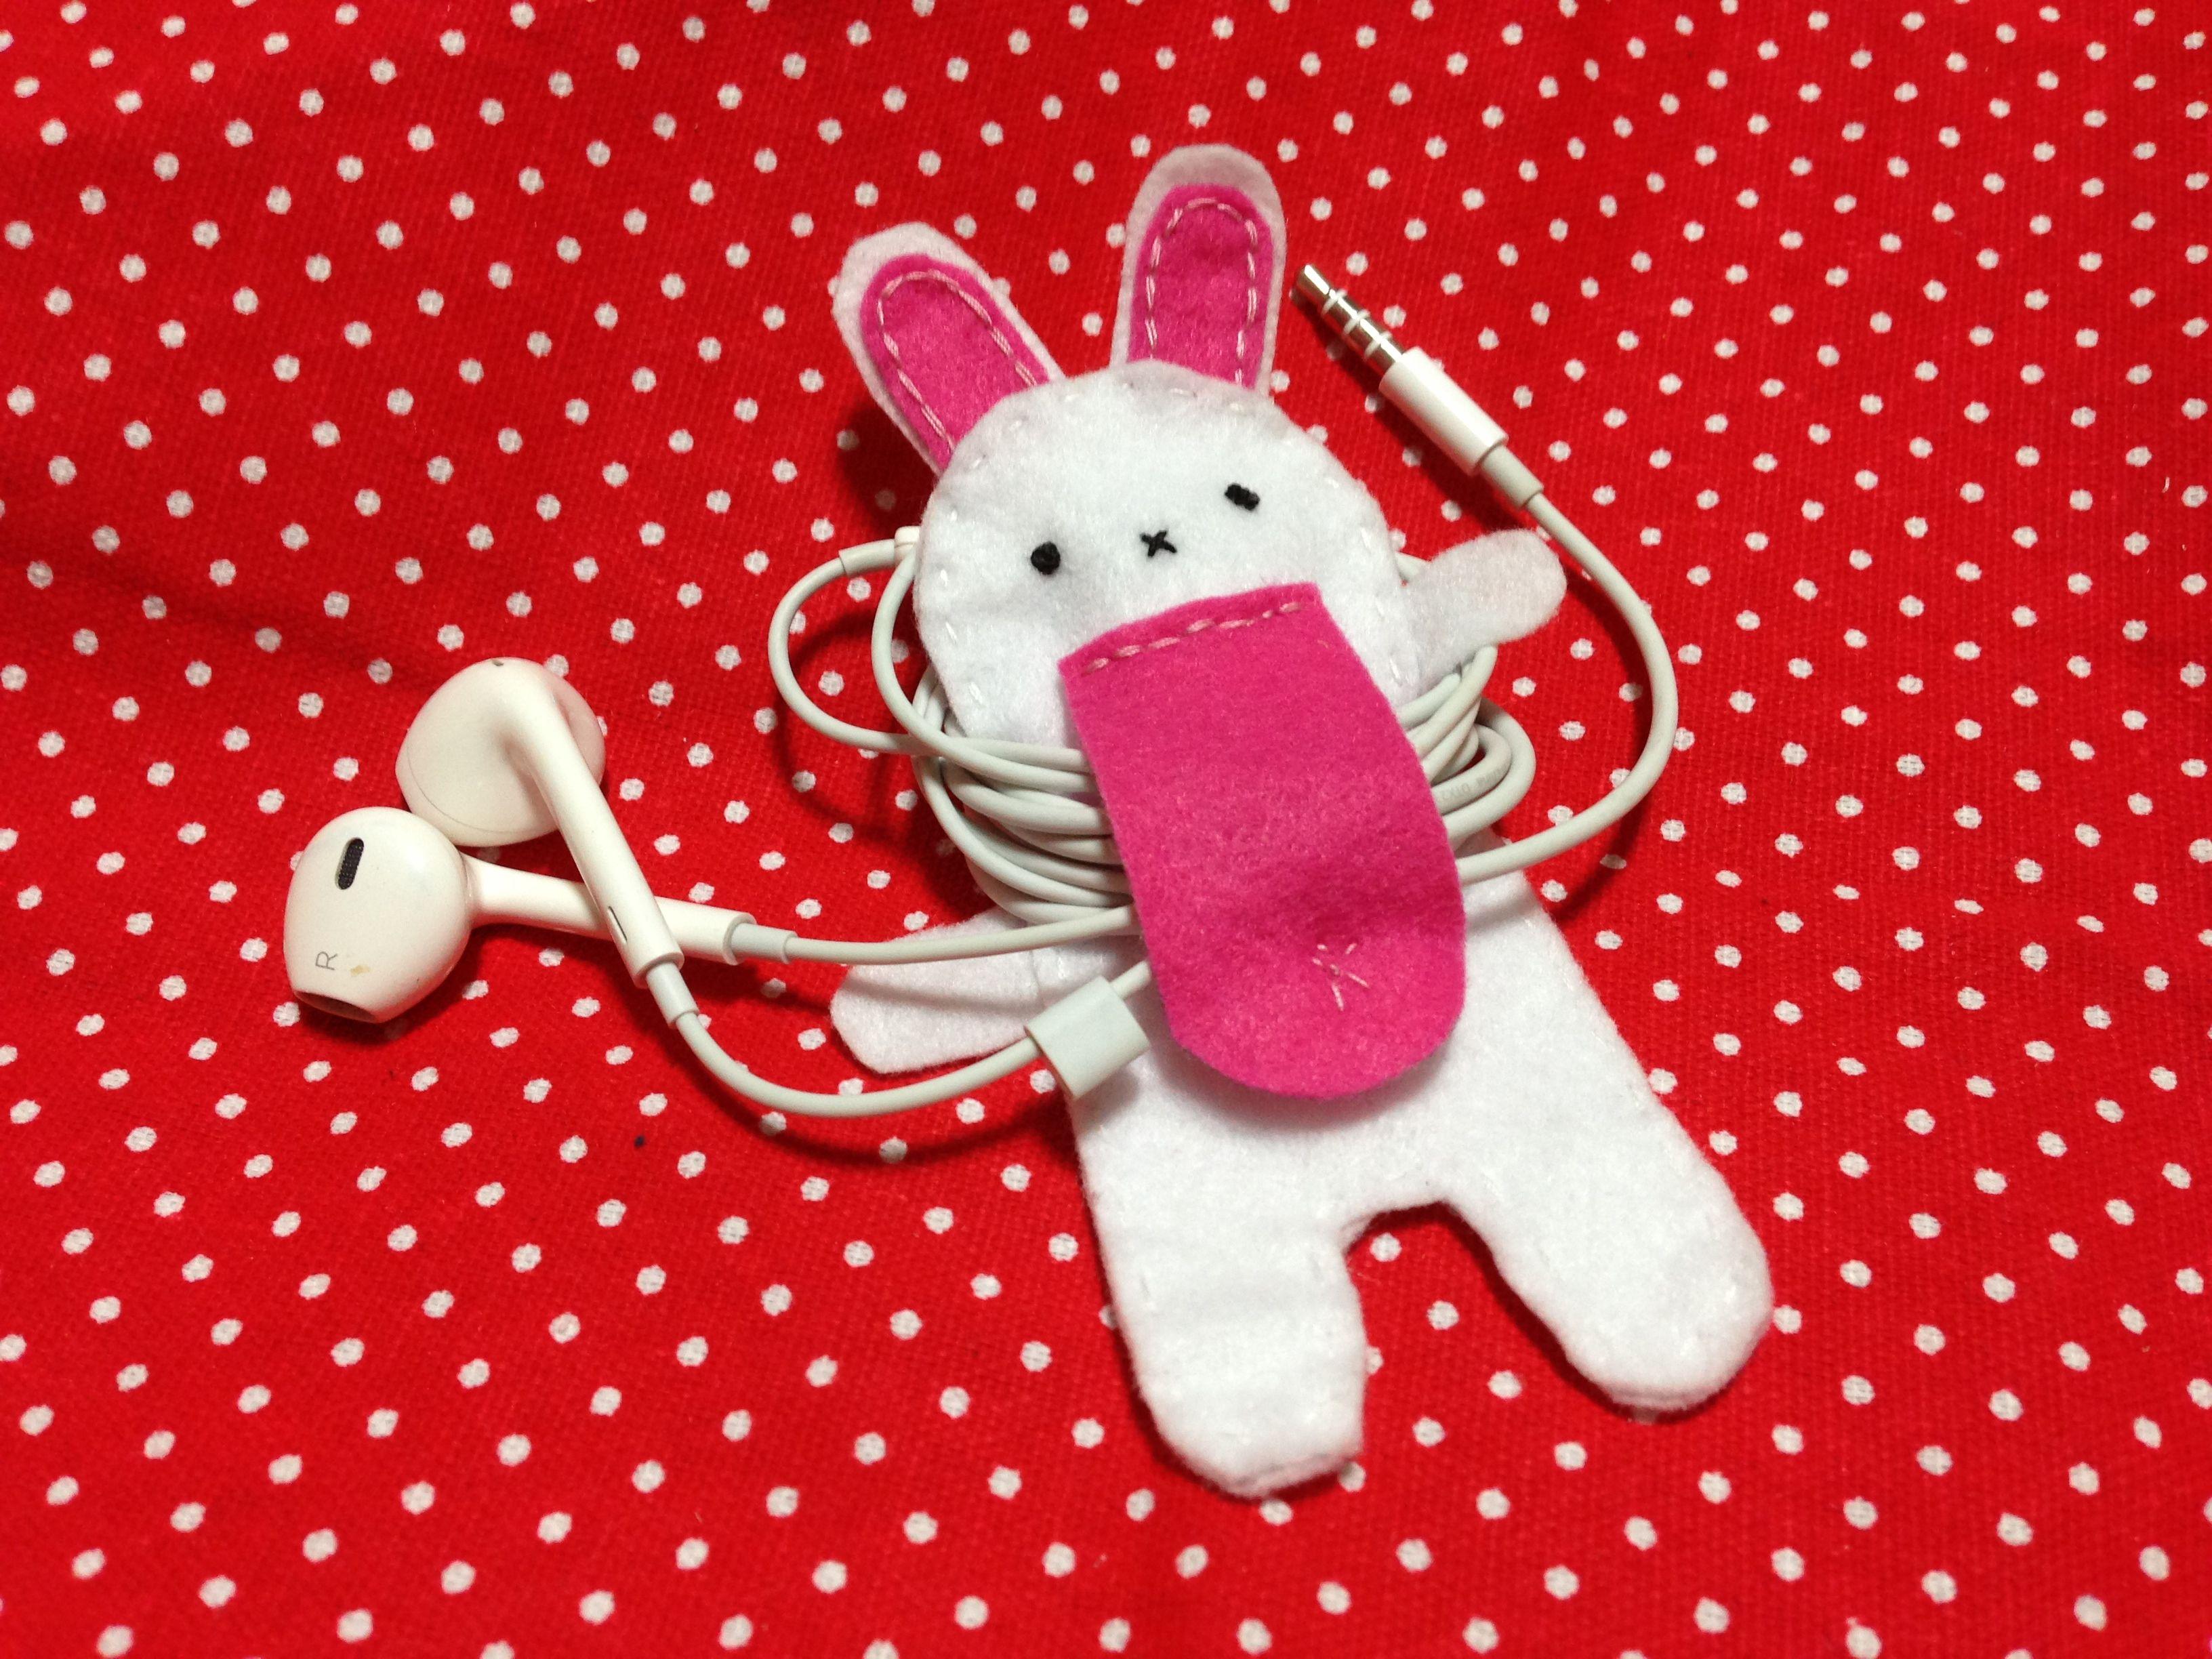 Bunny Earphone Holder Christmas Ornaments Crafts Novelty Christmas